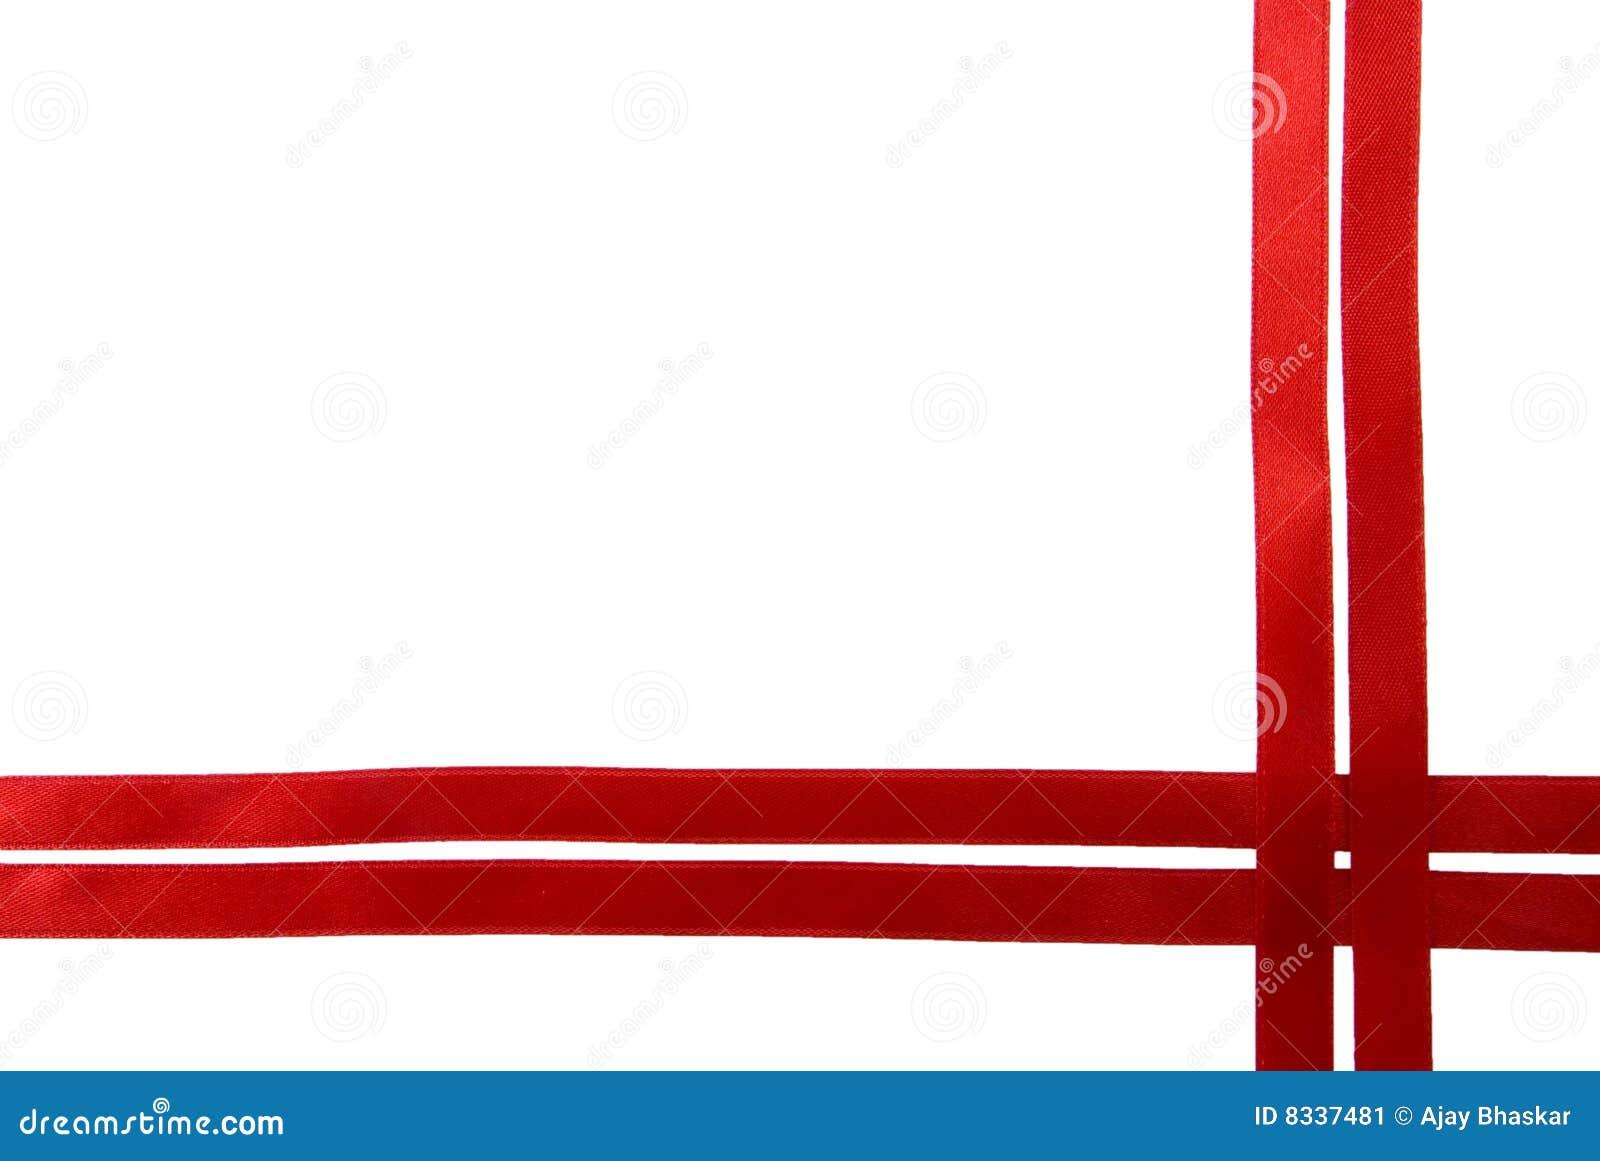 red ribbon border stock image